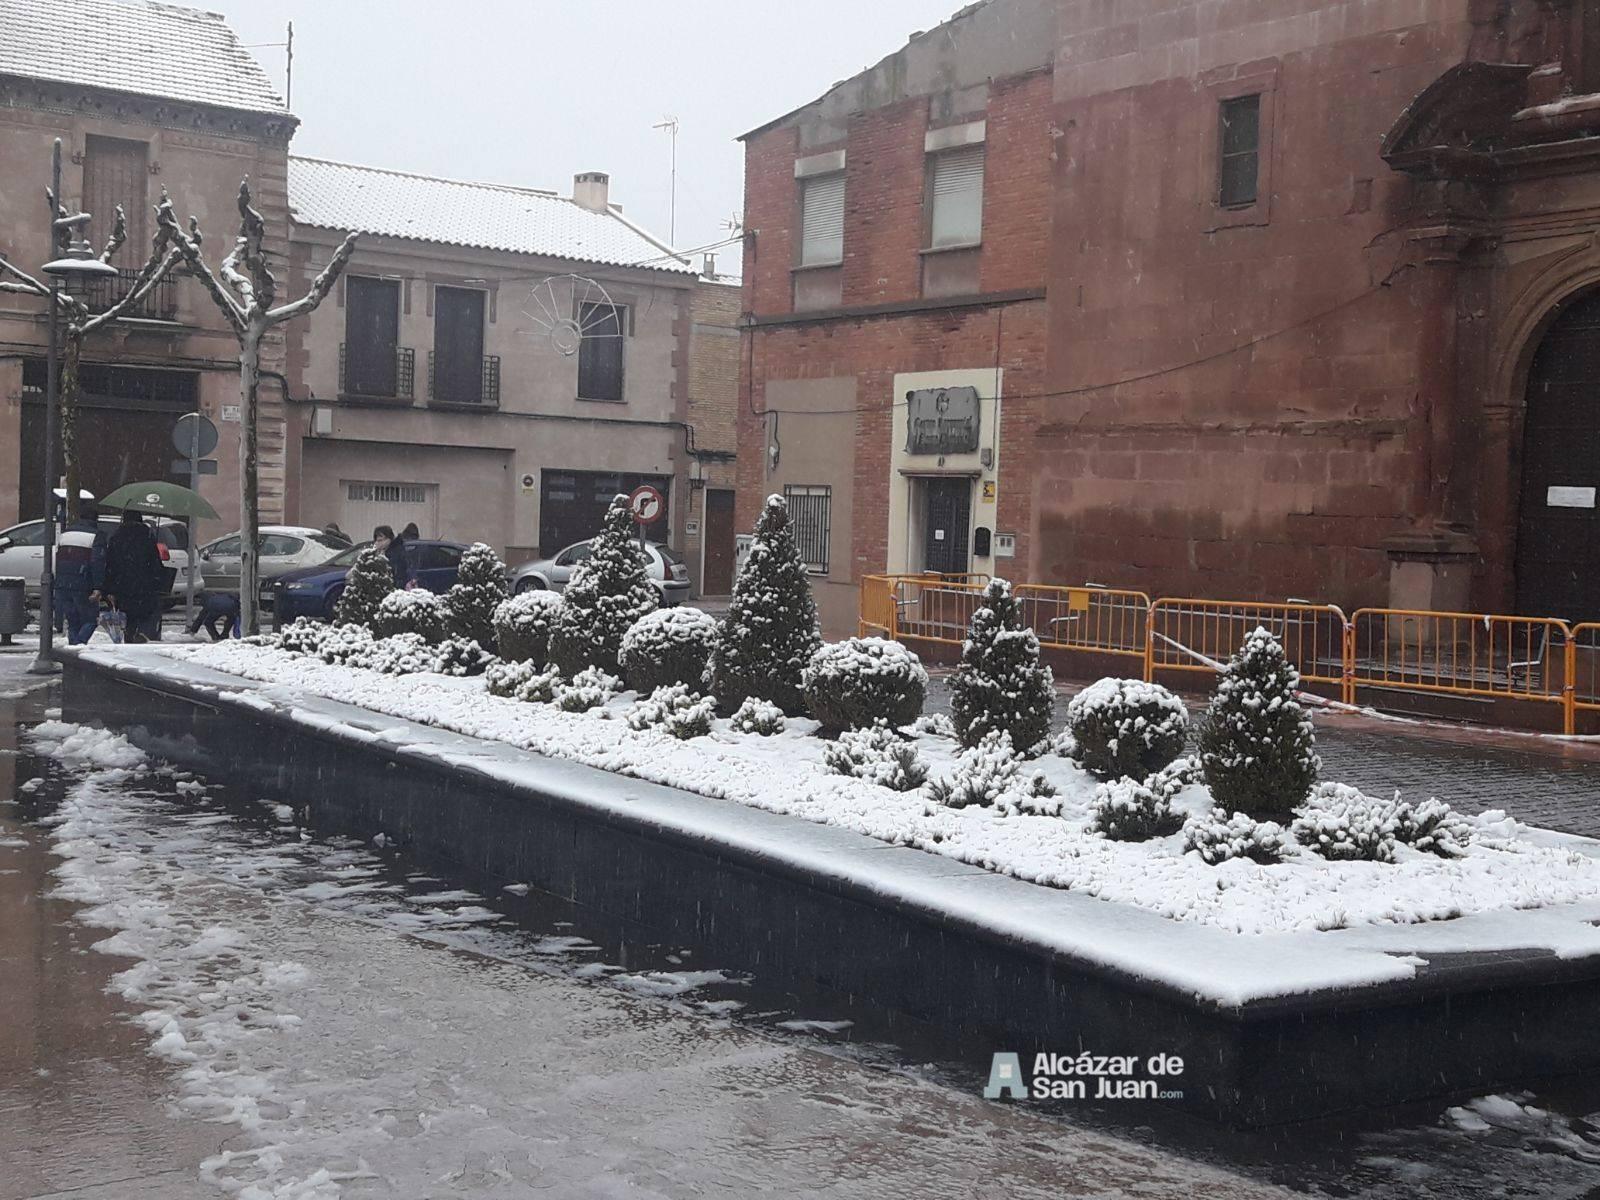 alcazar-calles-nieve-5 1